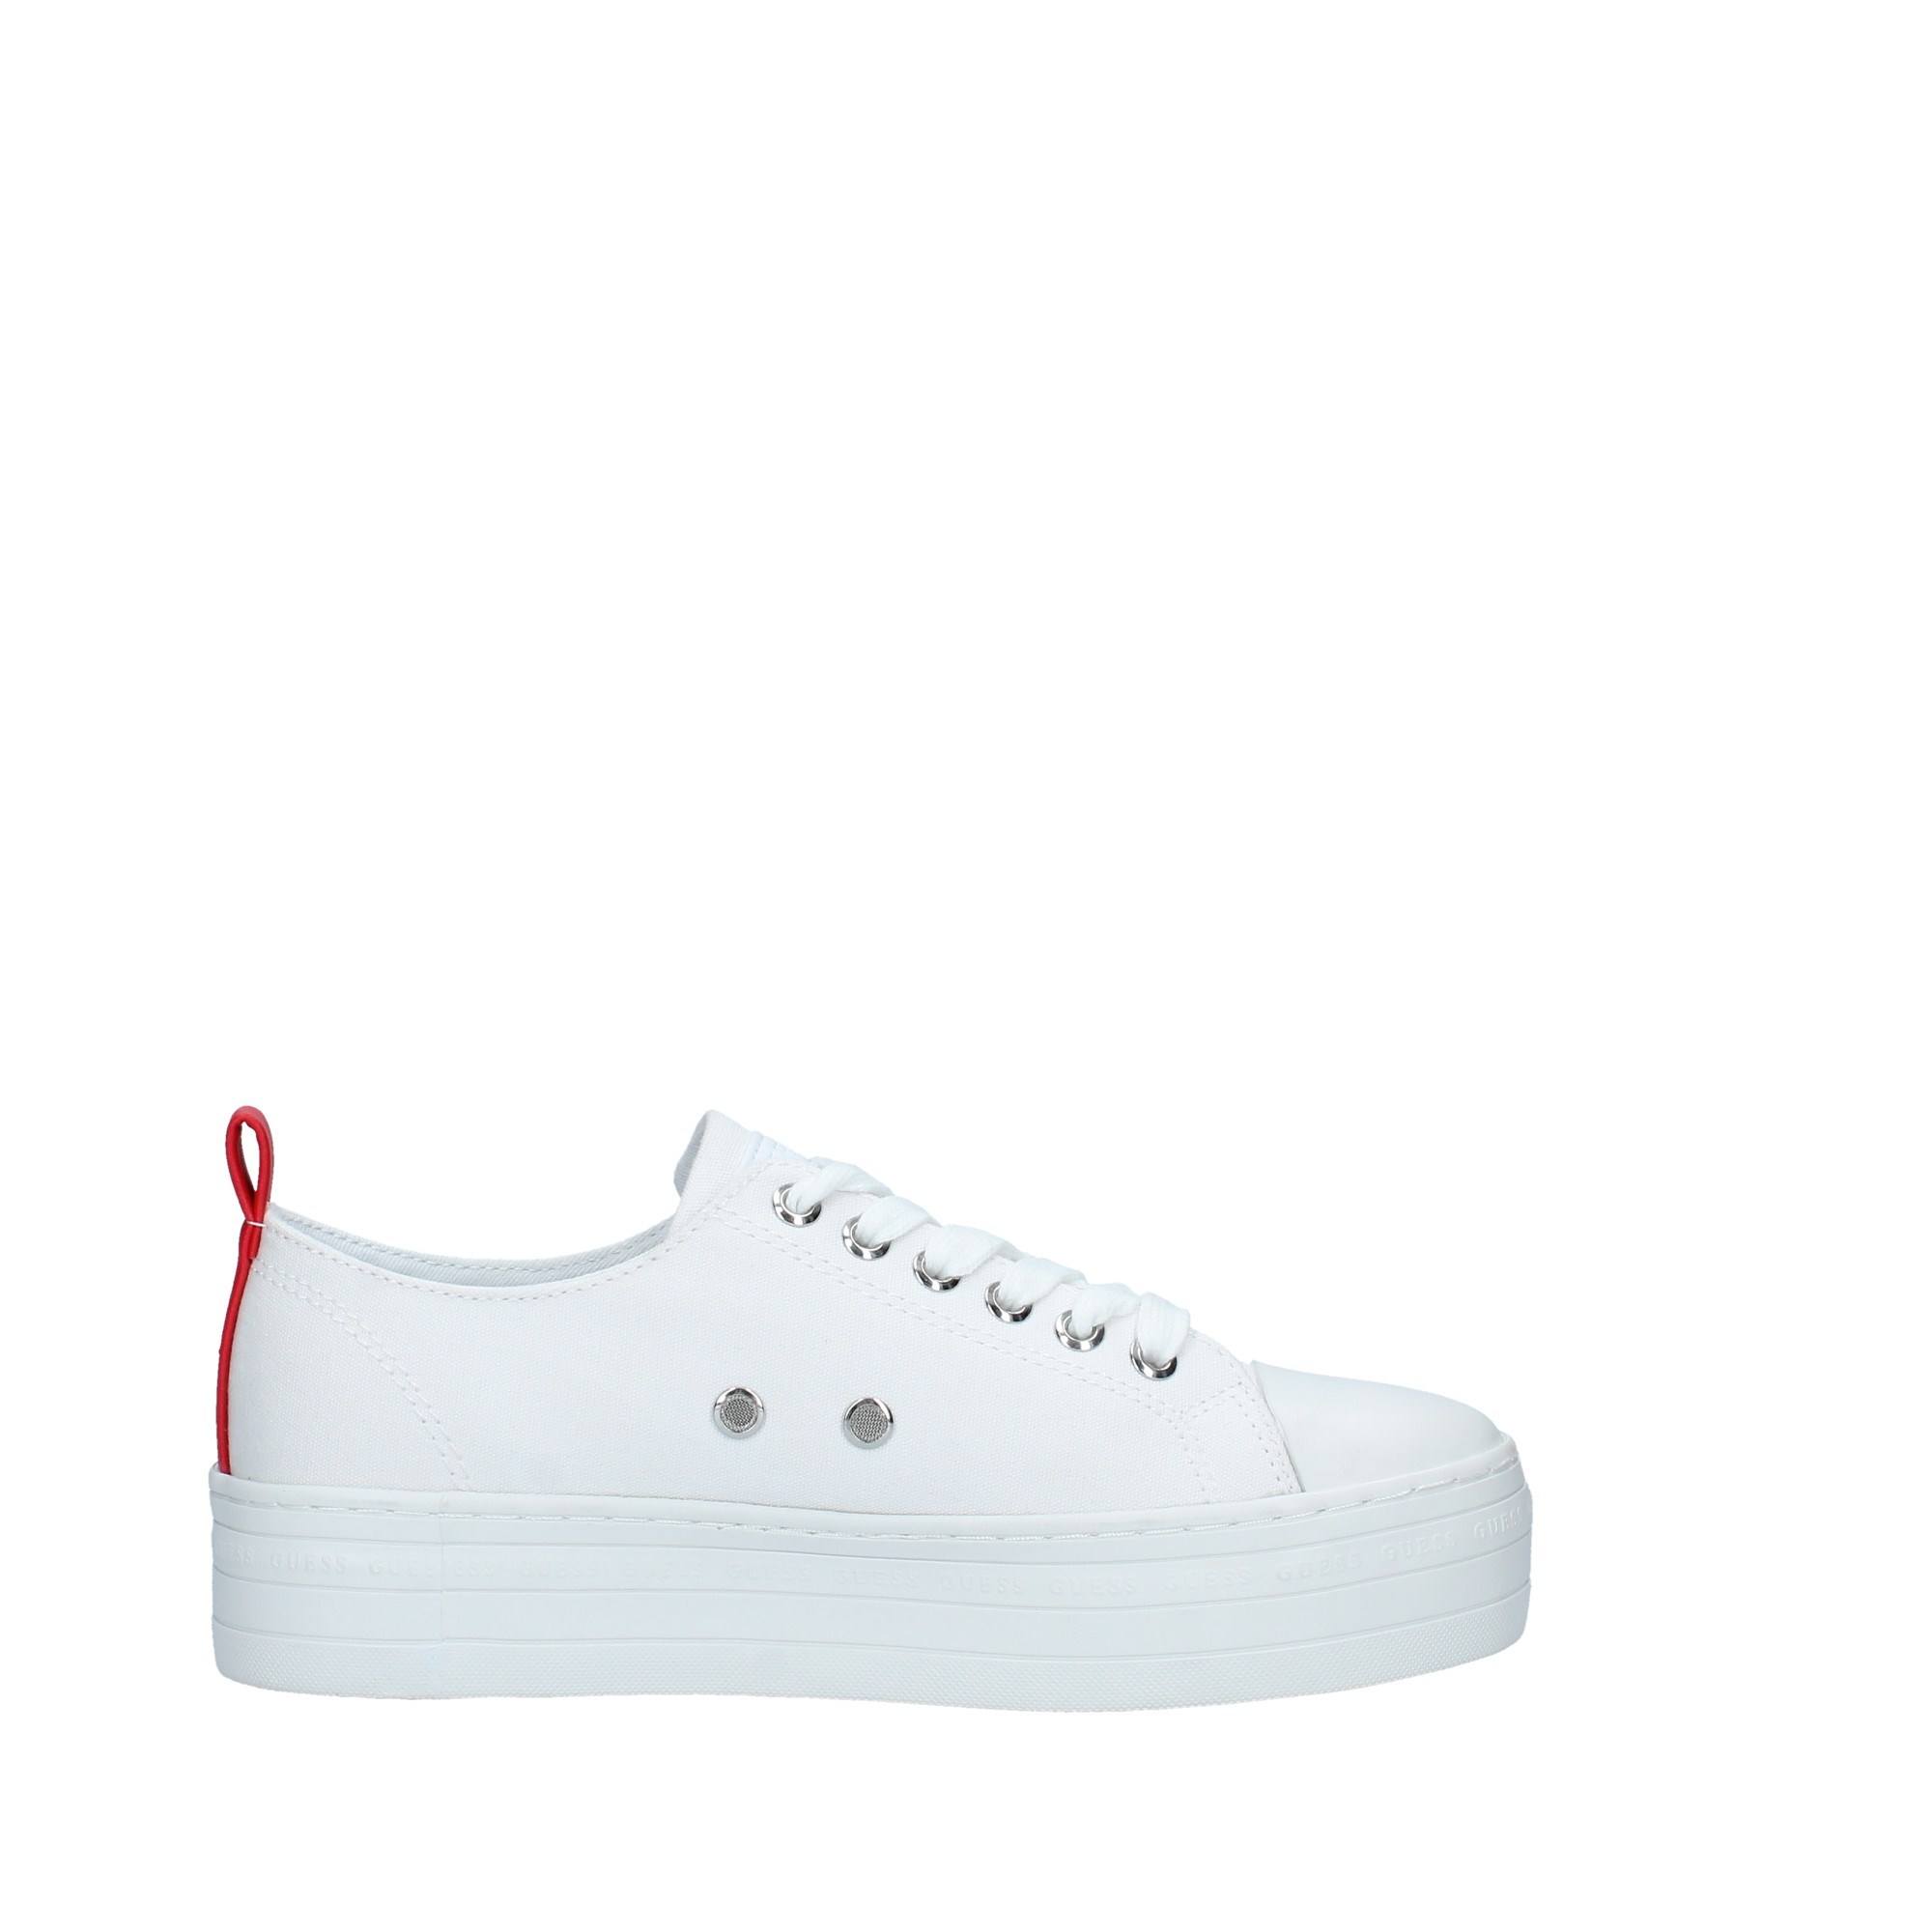 Sneaker Femme Guess Brigs Fl6brsfab12